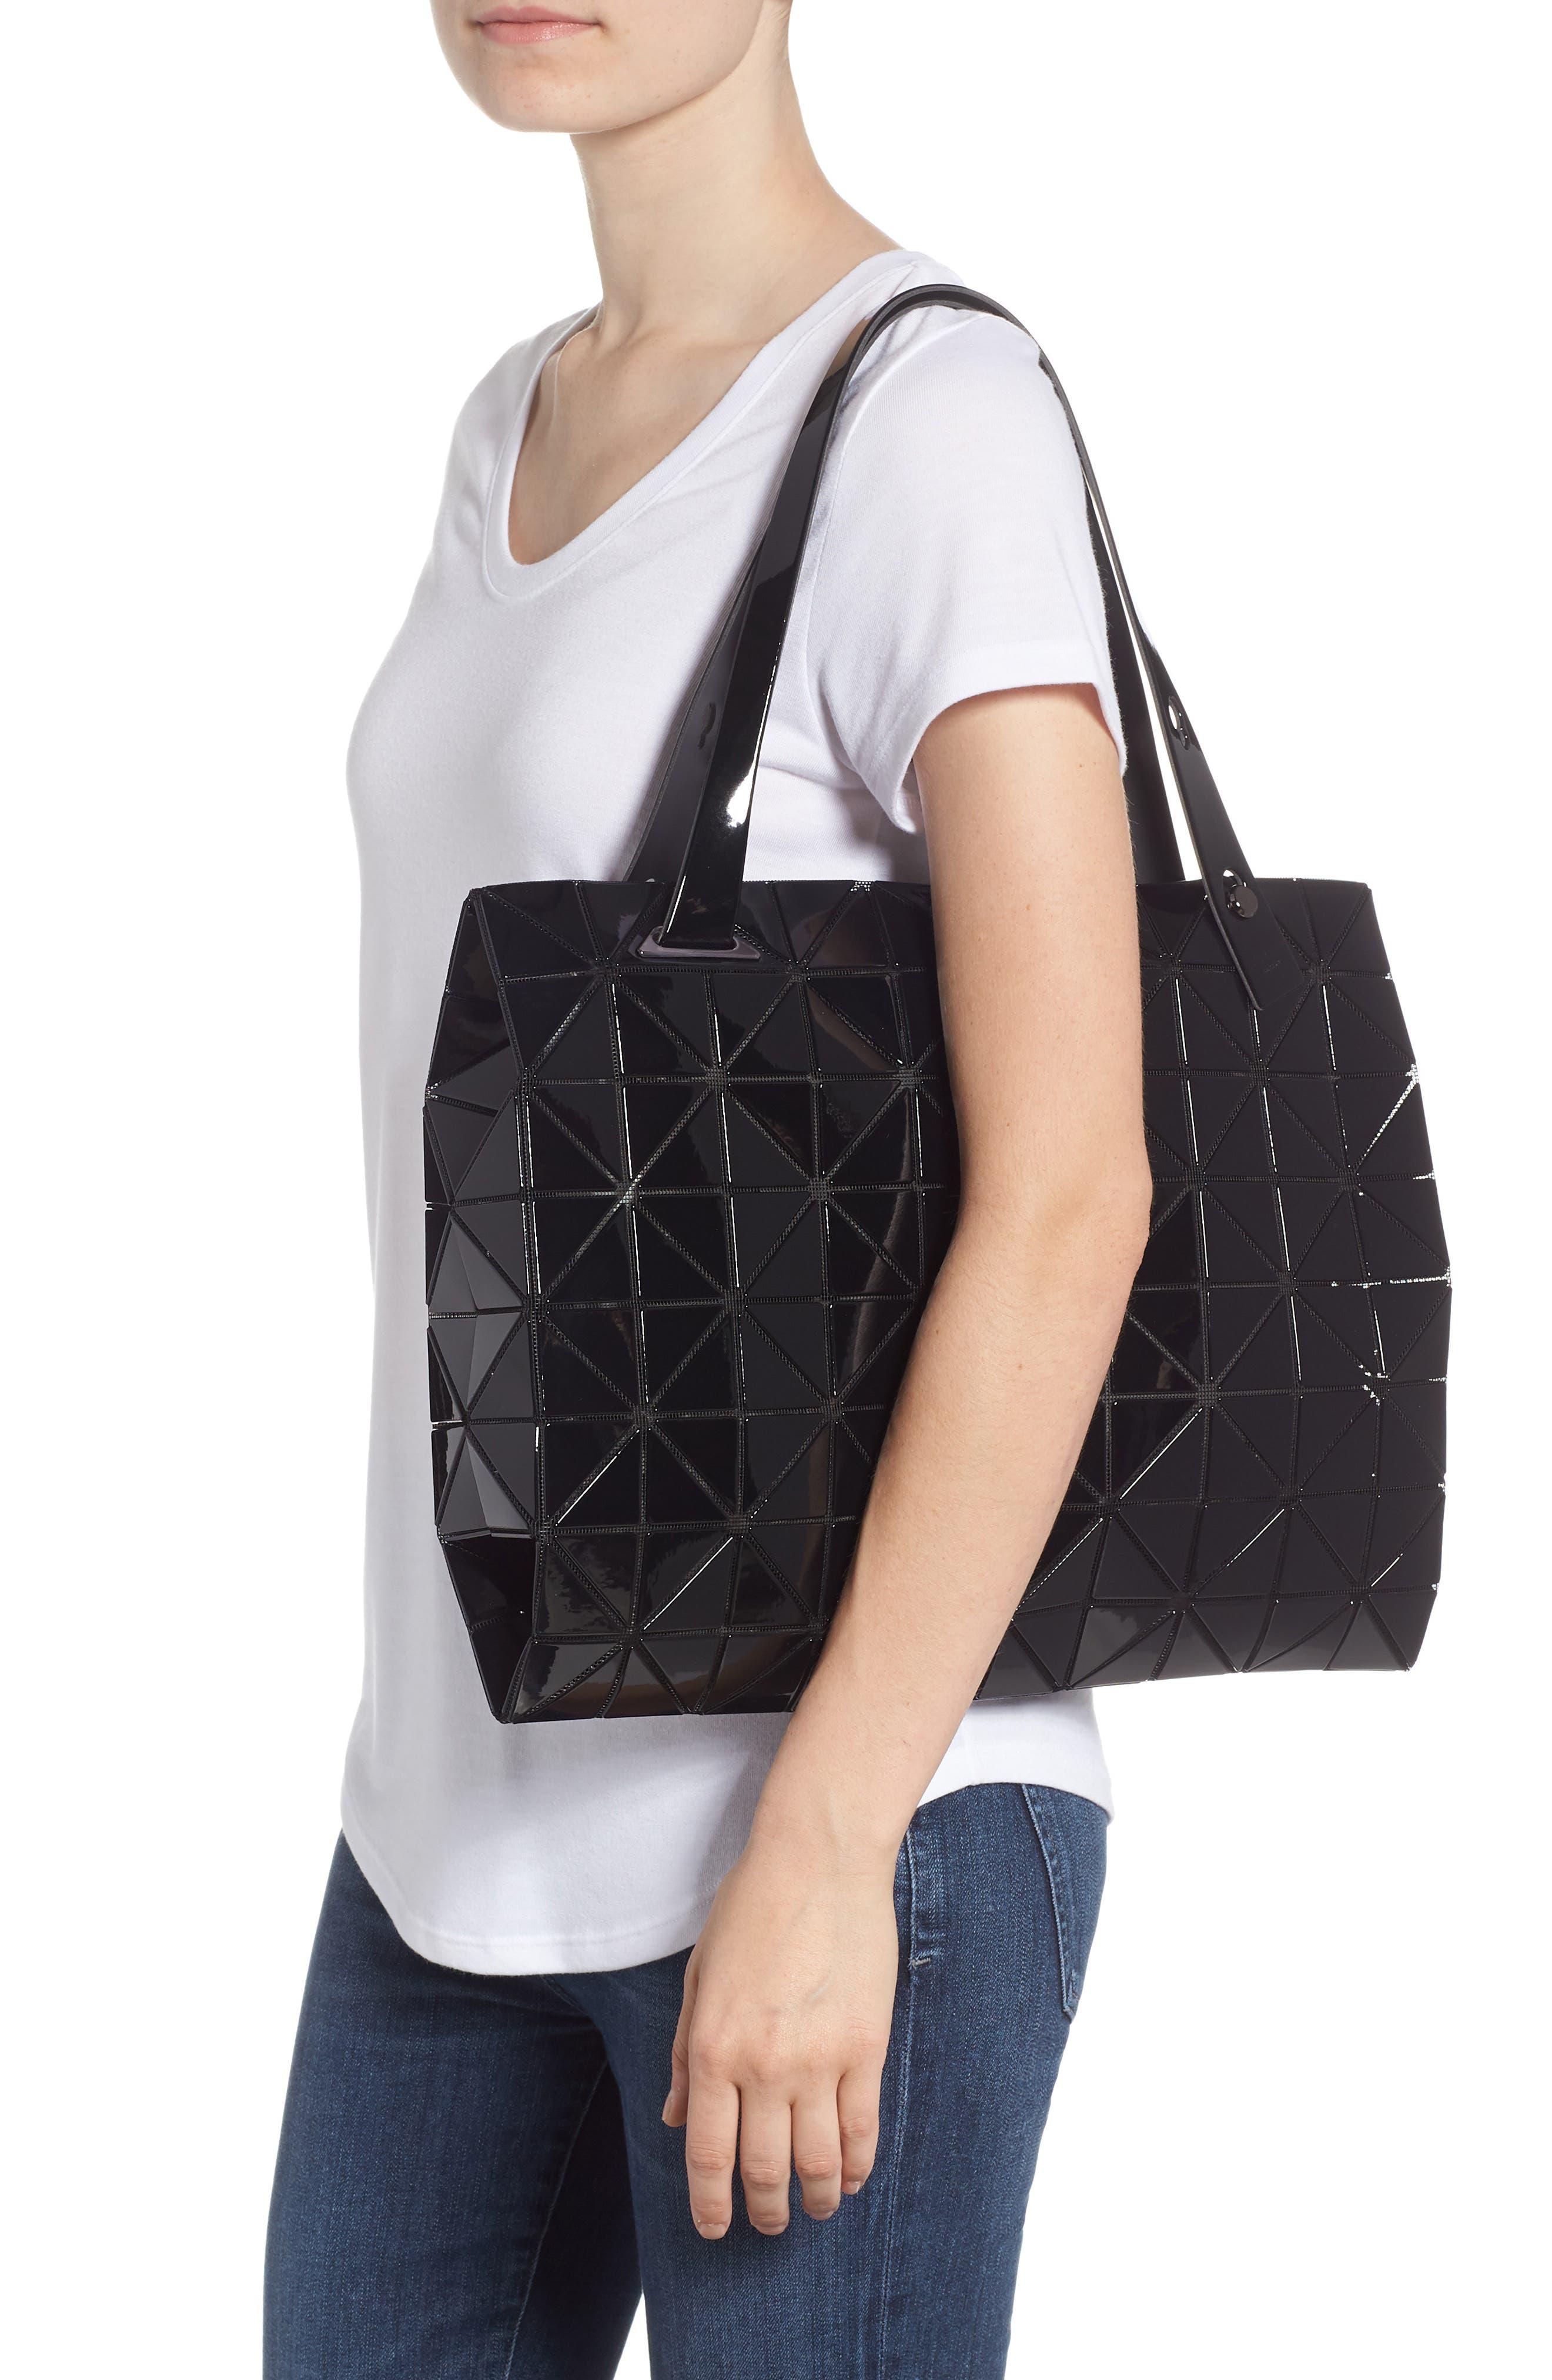 Carton Prism Tote Bag,                             Alternate thumbnail 2, color,                             BLACK